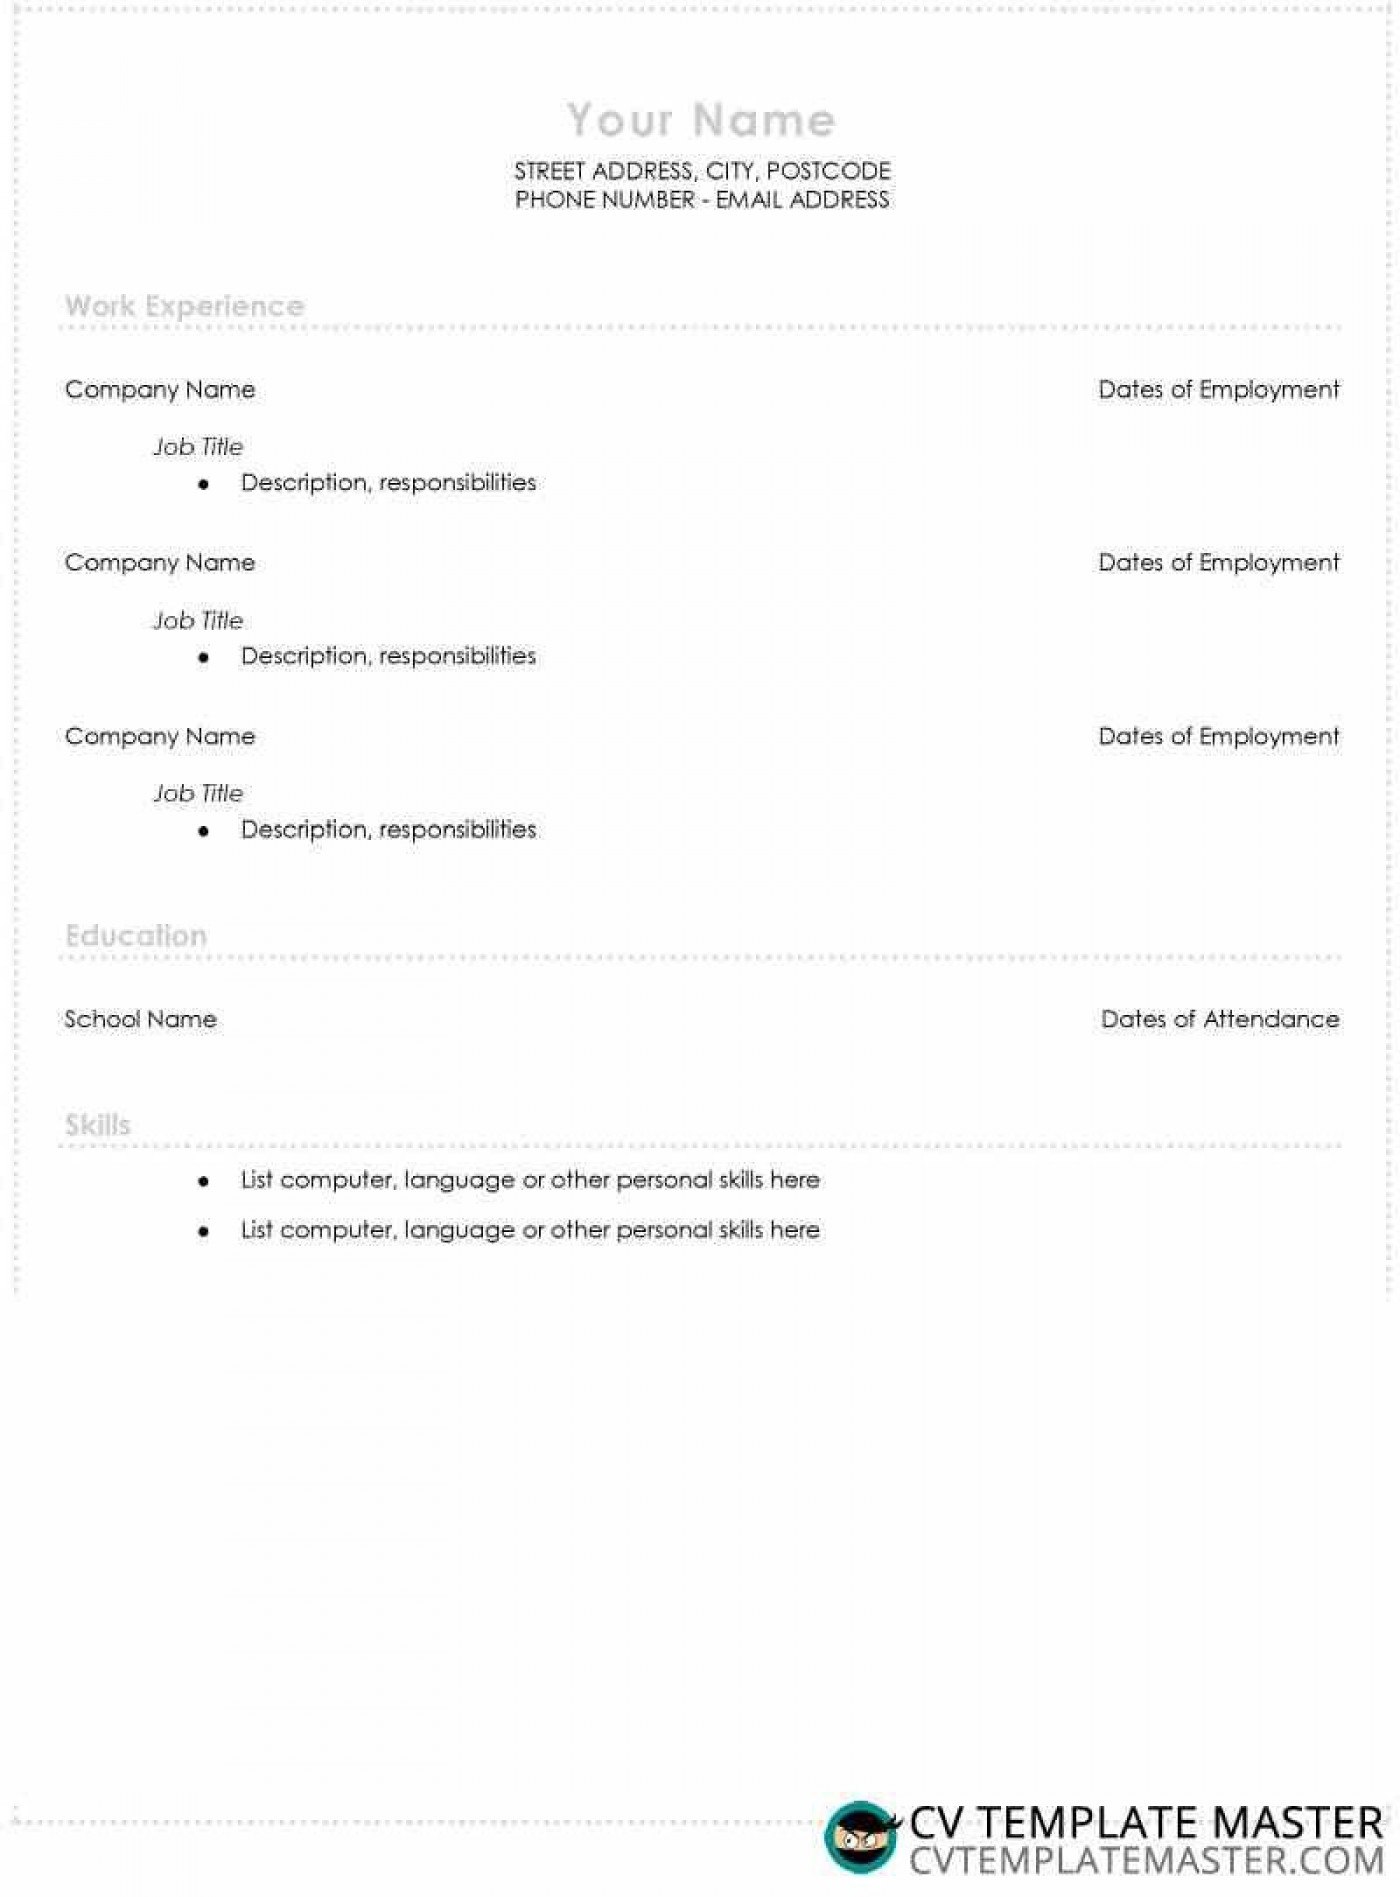 006 Remarkable Resume Template High School Idea  Student Australia For Google Doc Graduate Microsoft Word1400